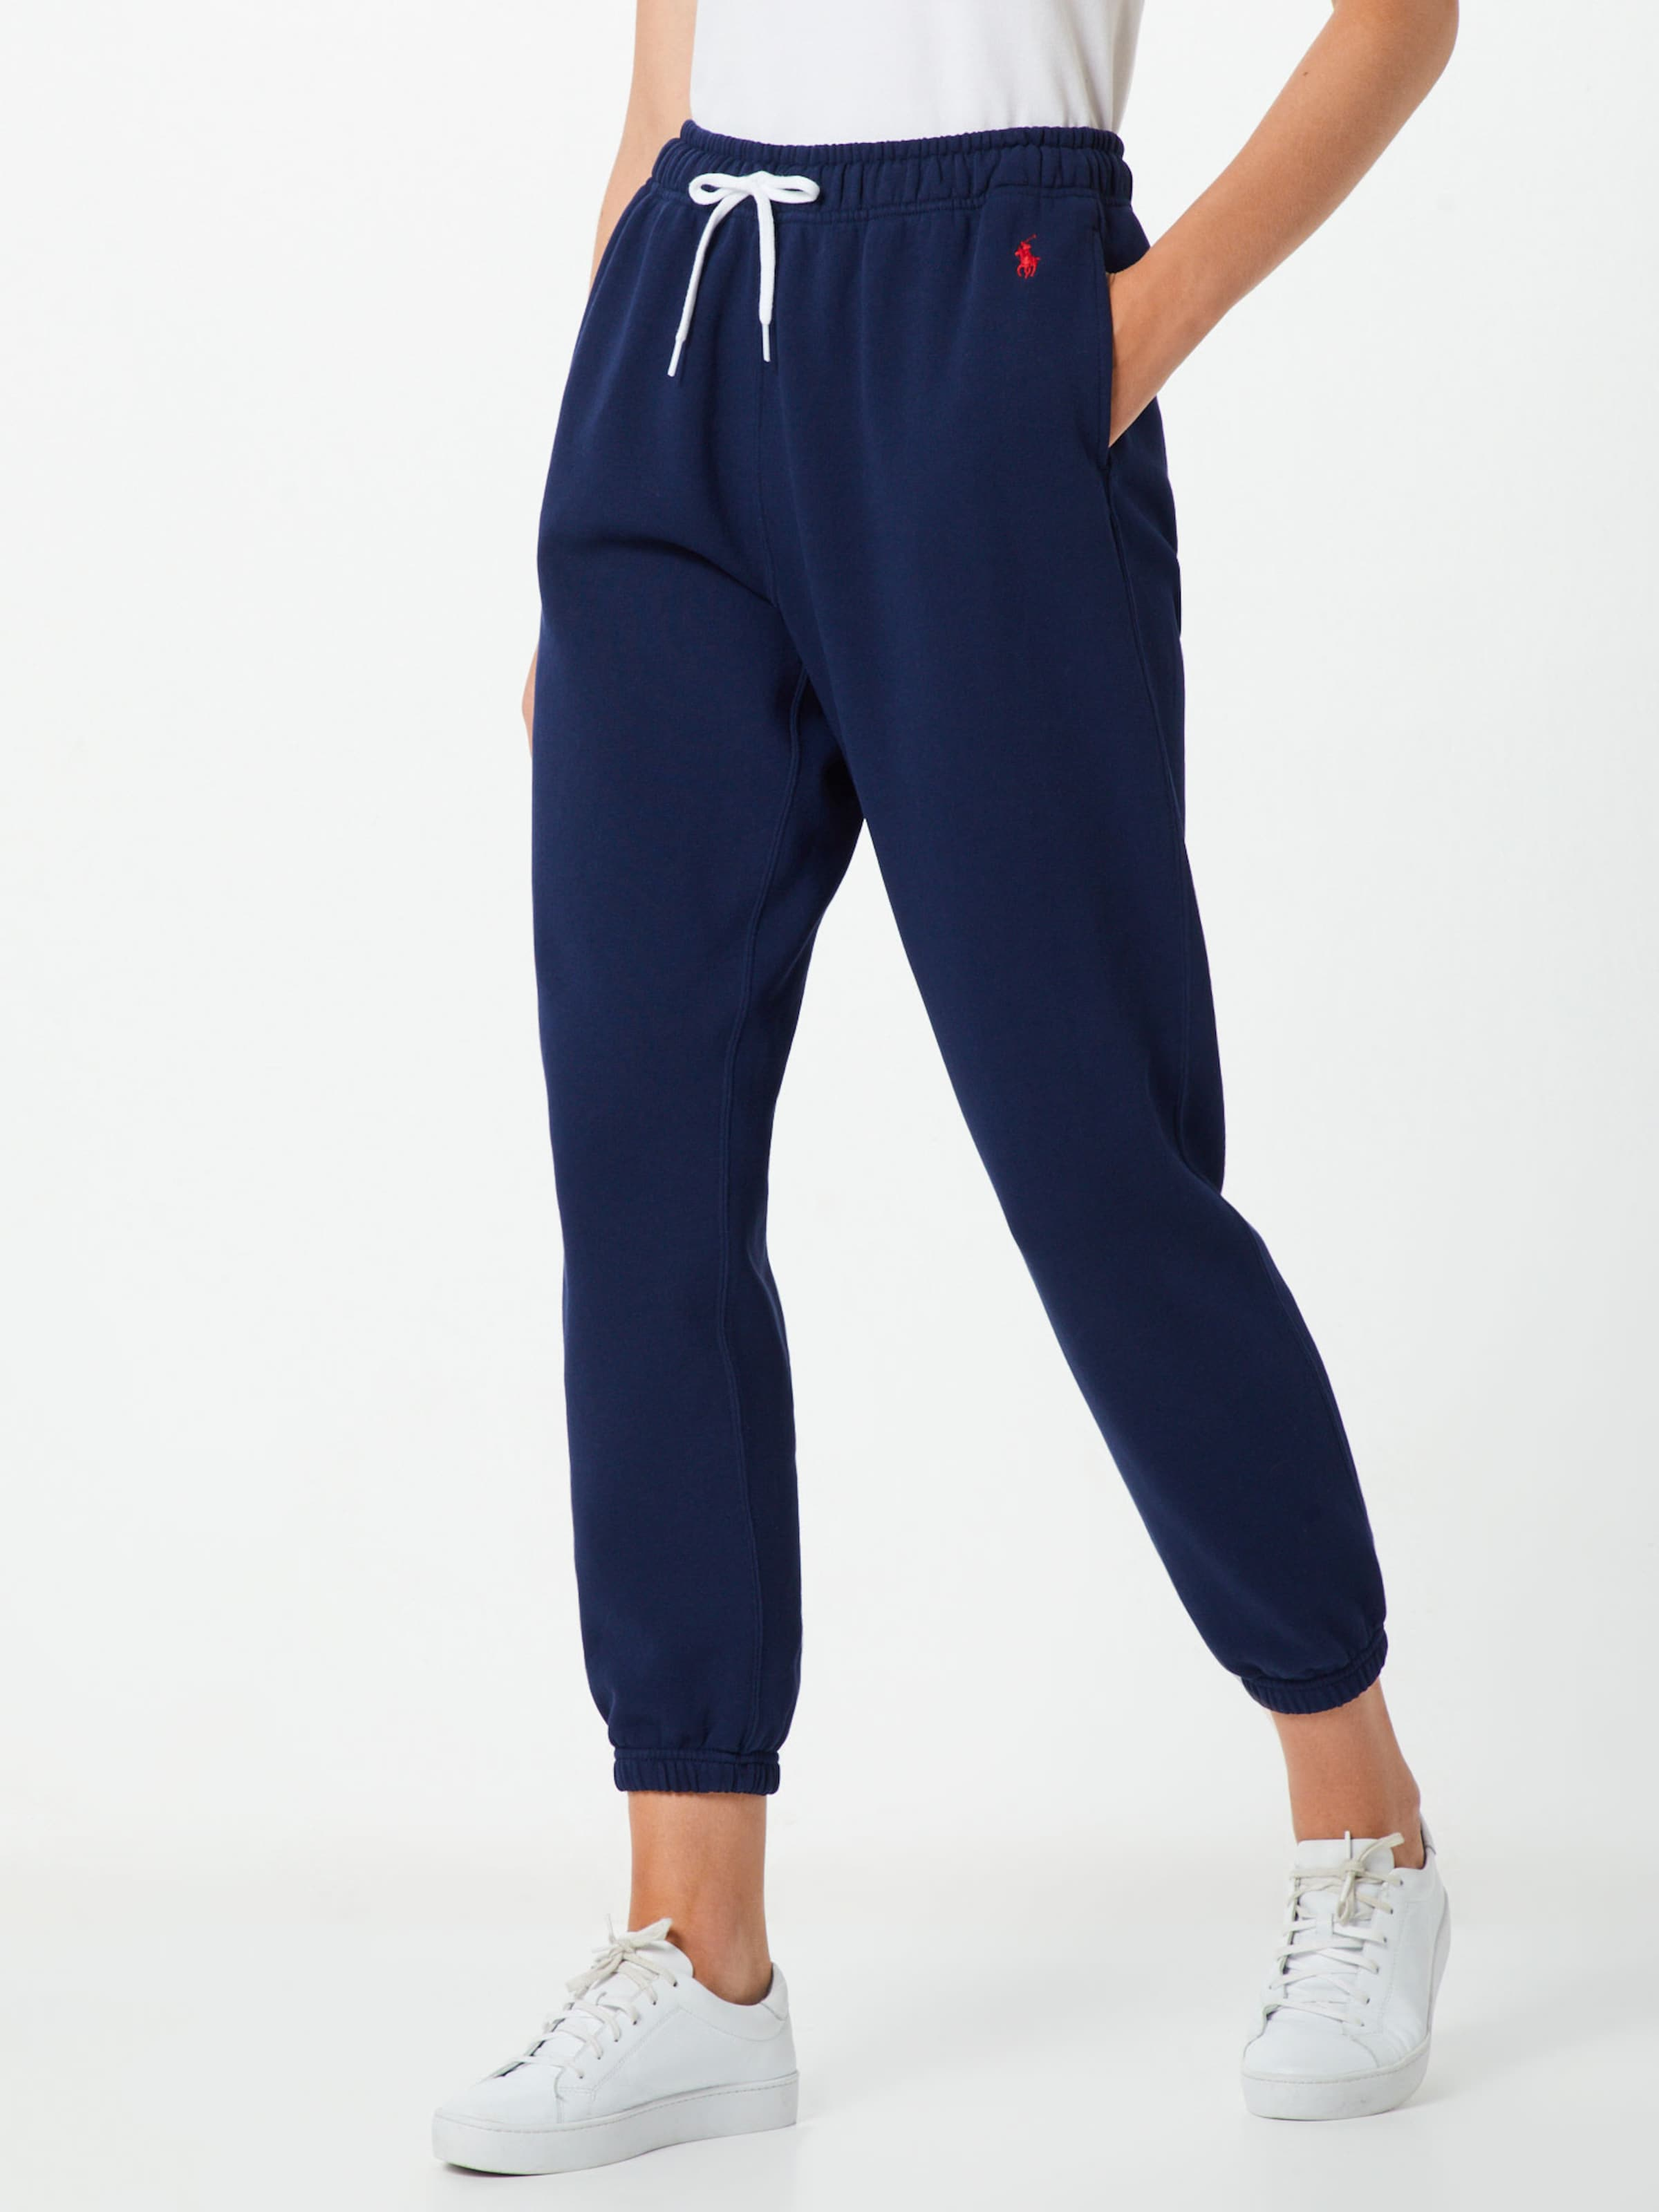 Pantalon En NoirBlanc Polo Ralph Lauren SVUzMLpGq